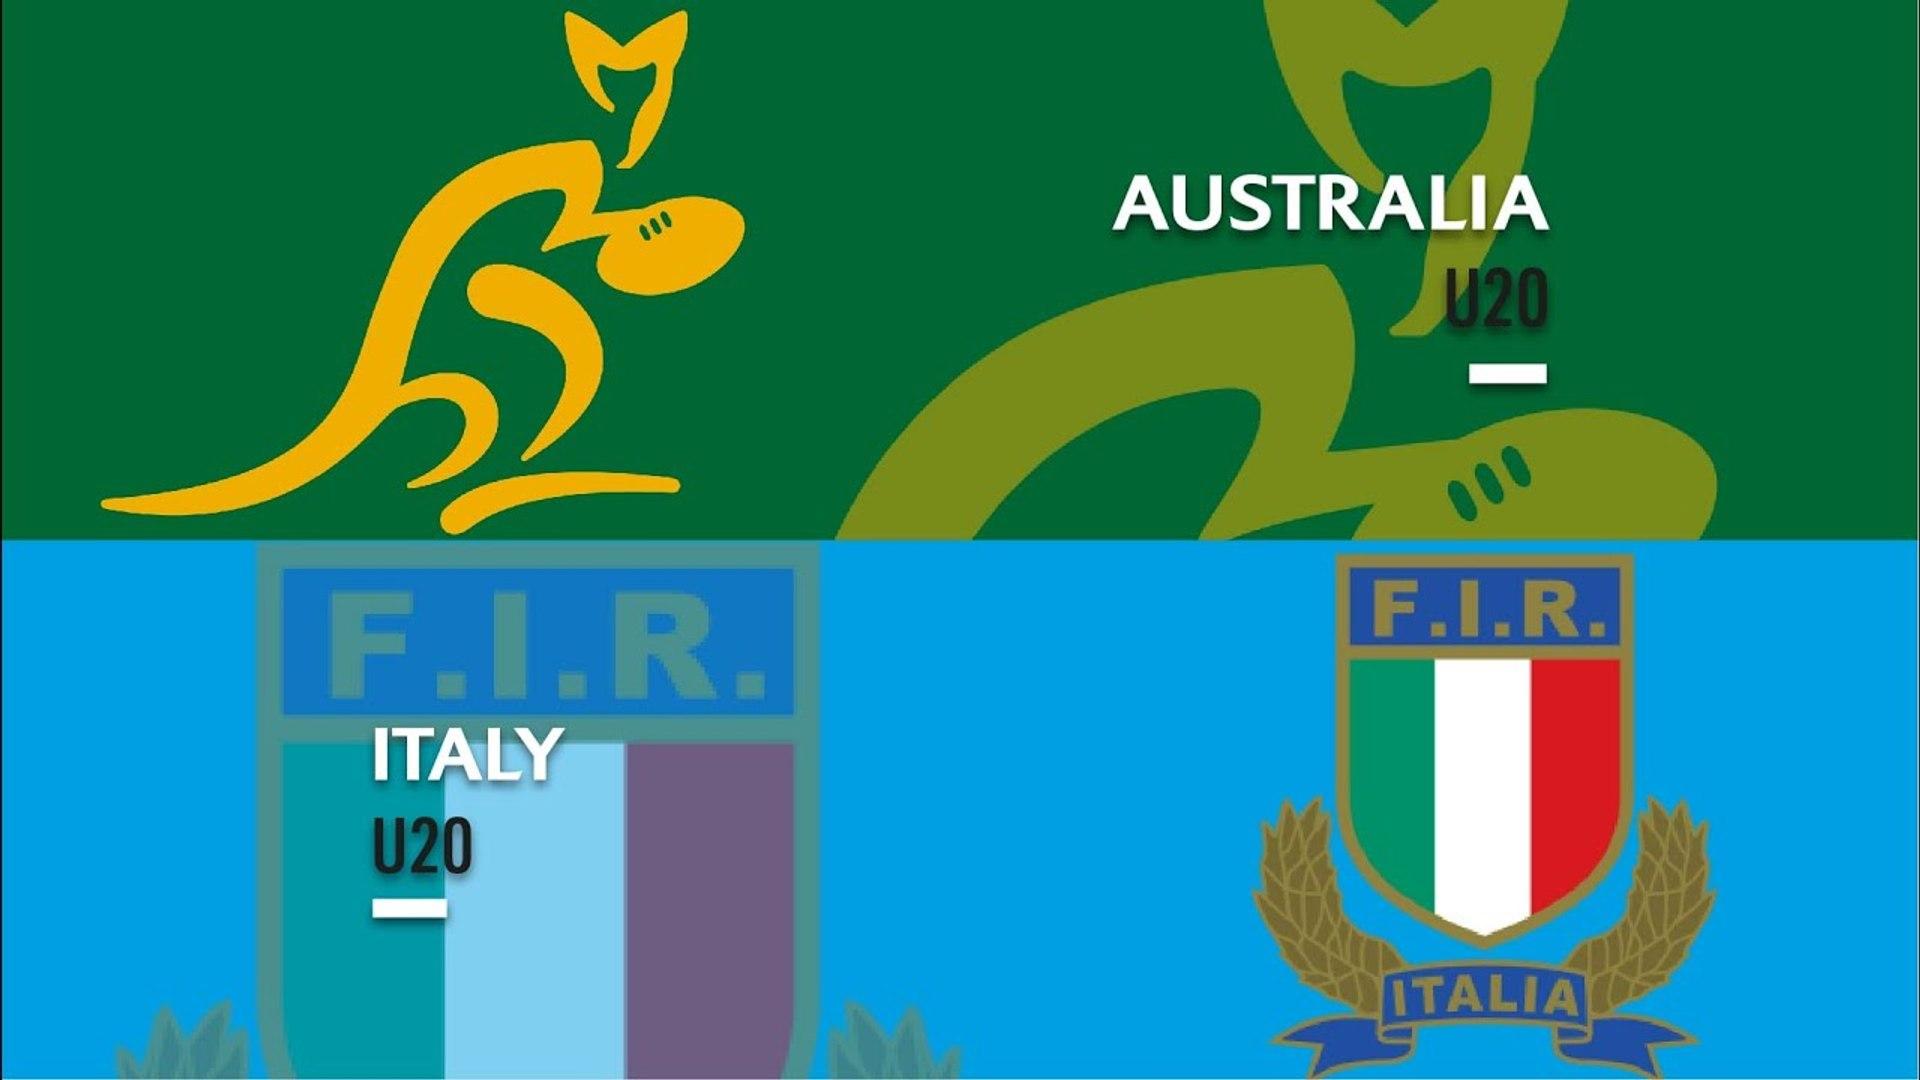 U20s Highlights: Australia beat Italy